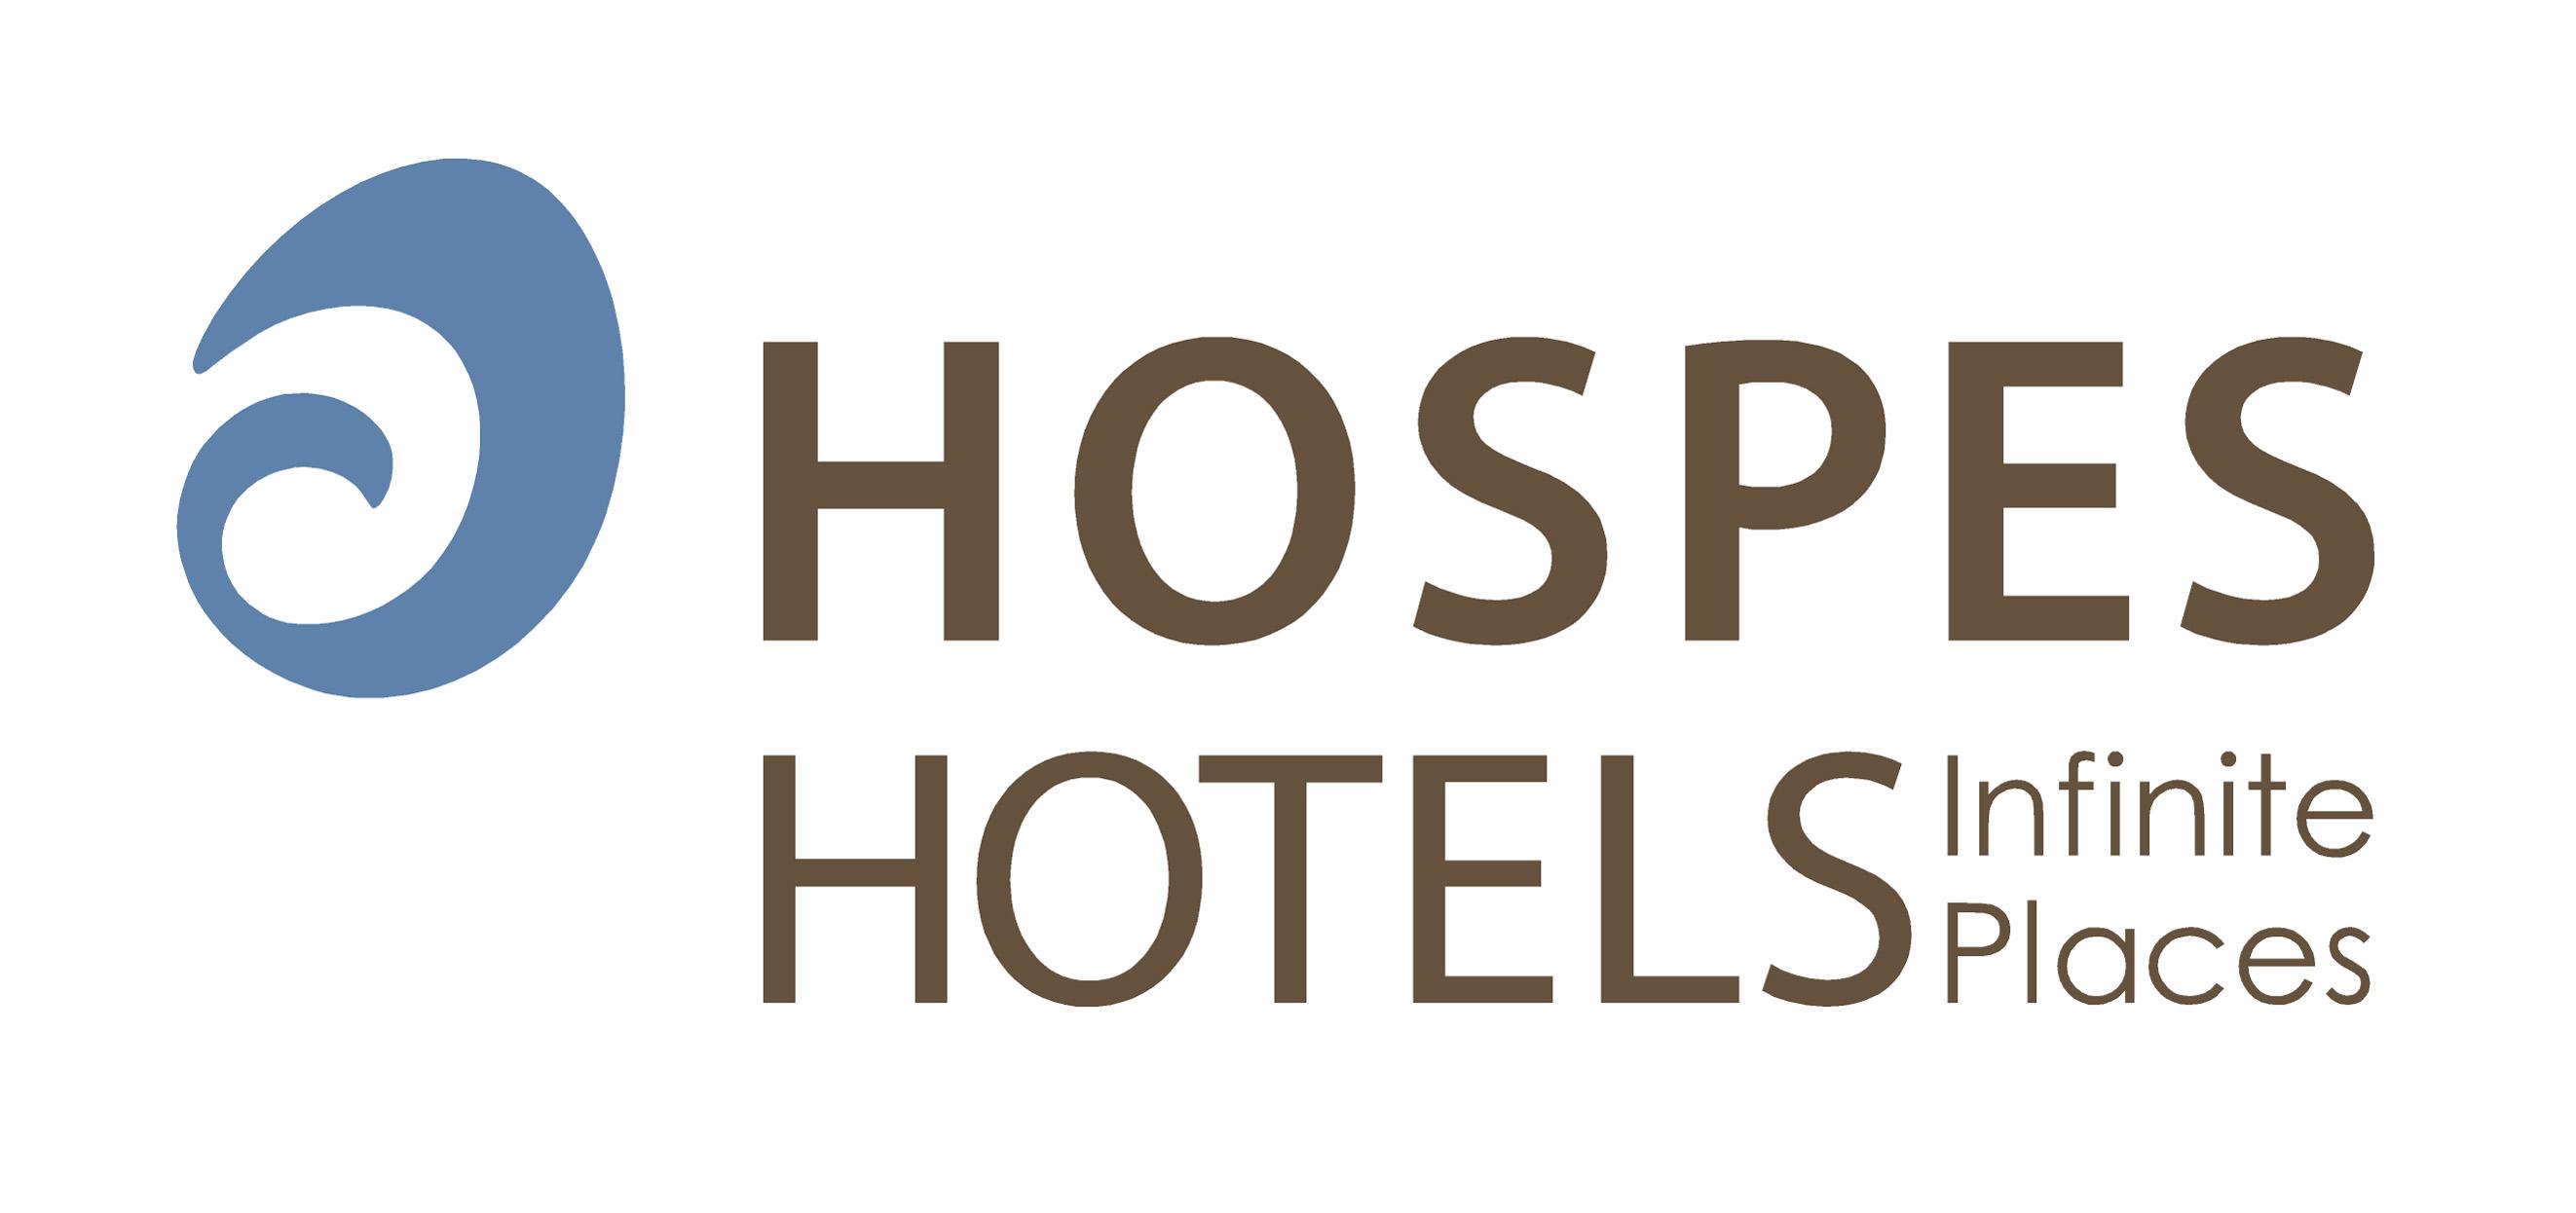 Hospes Hoteles